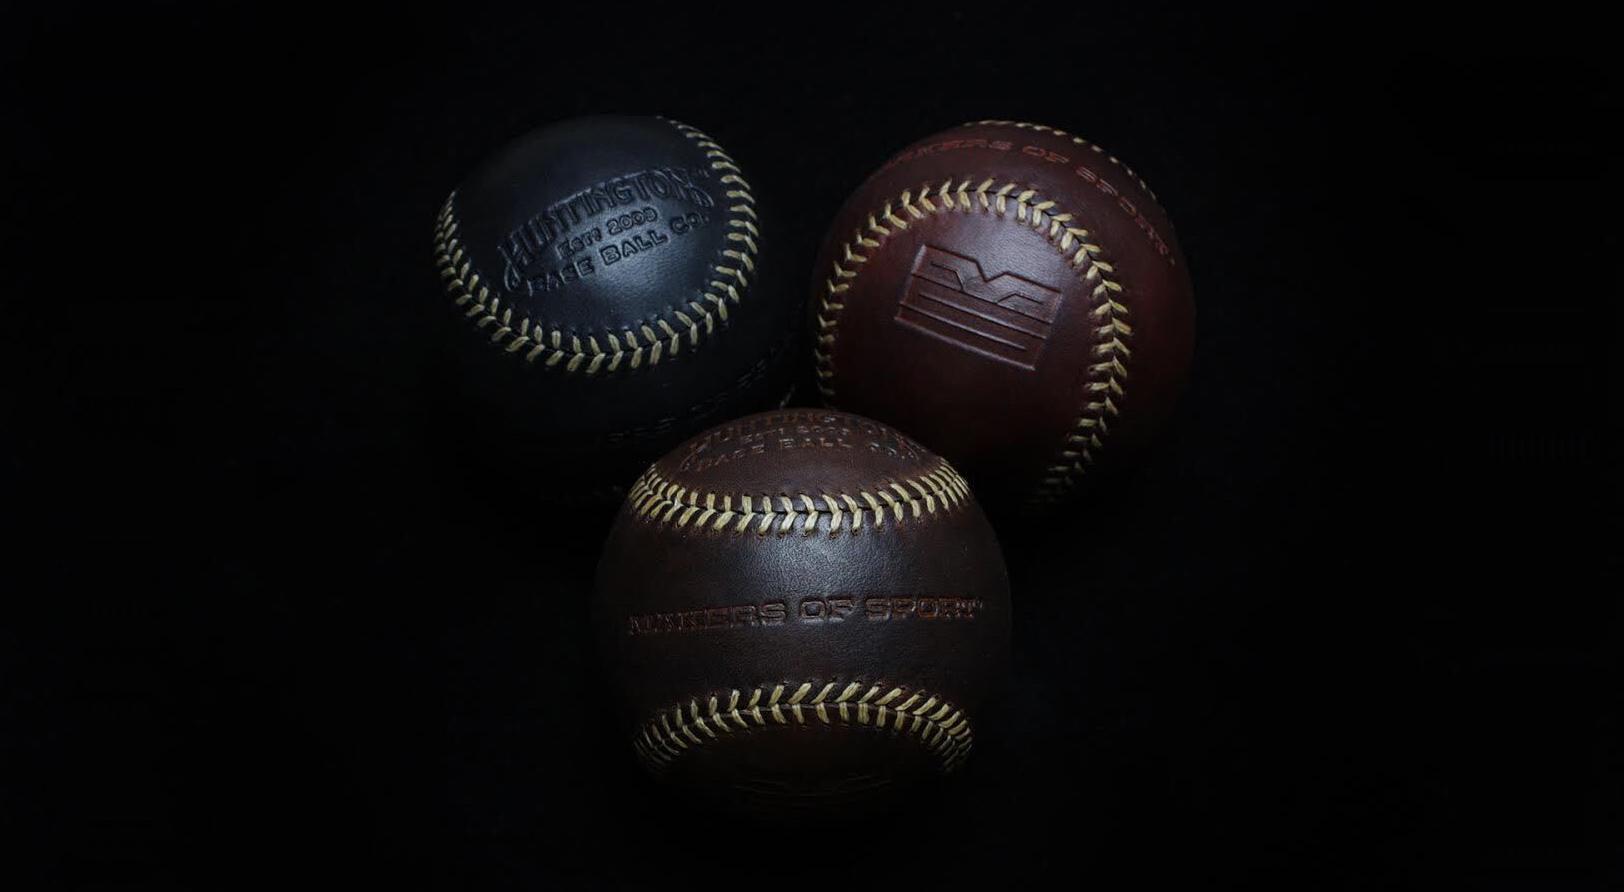 Makers of Sport® custom Huntington Baseball Co. baseballs